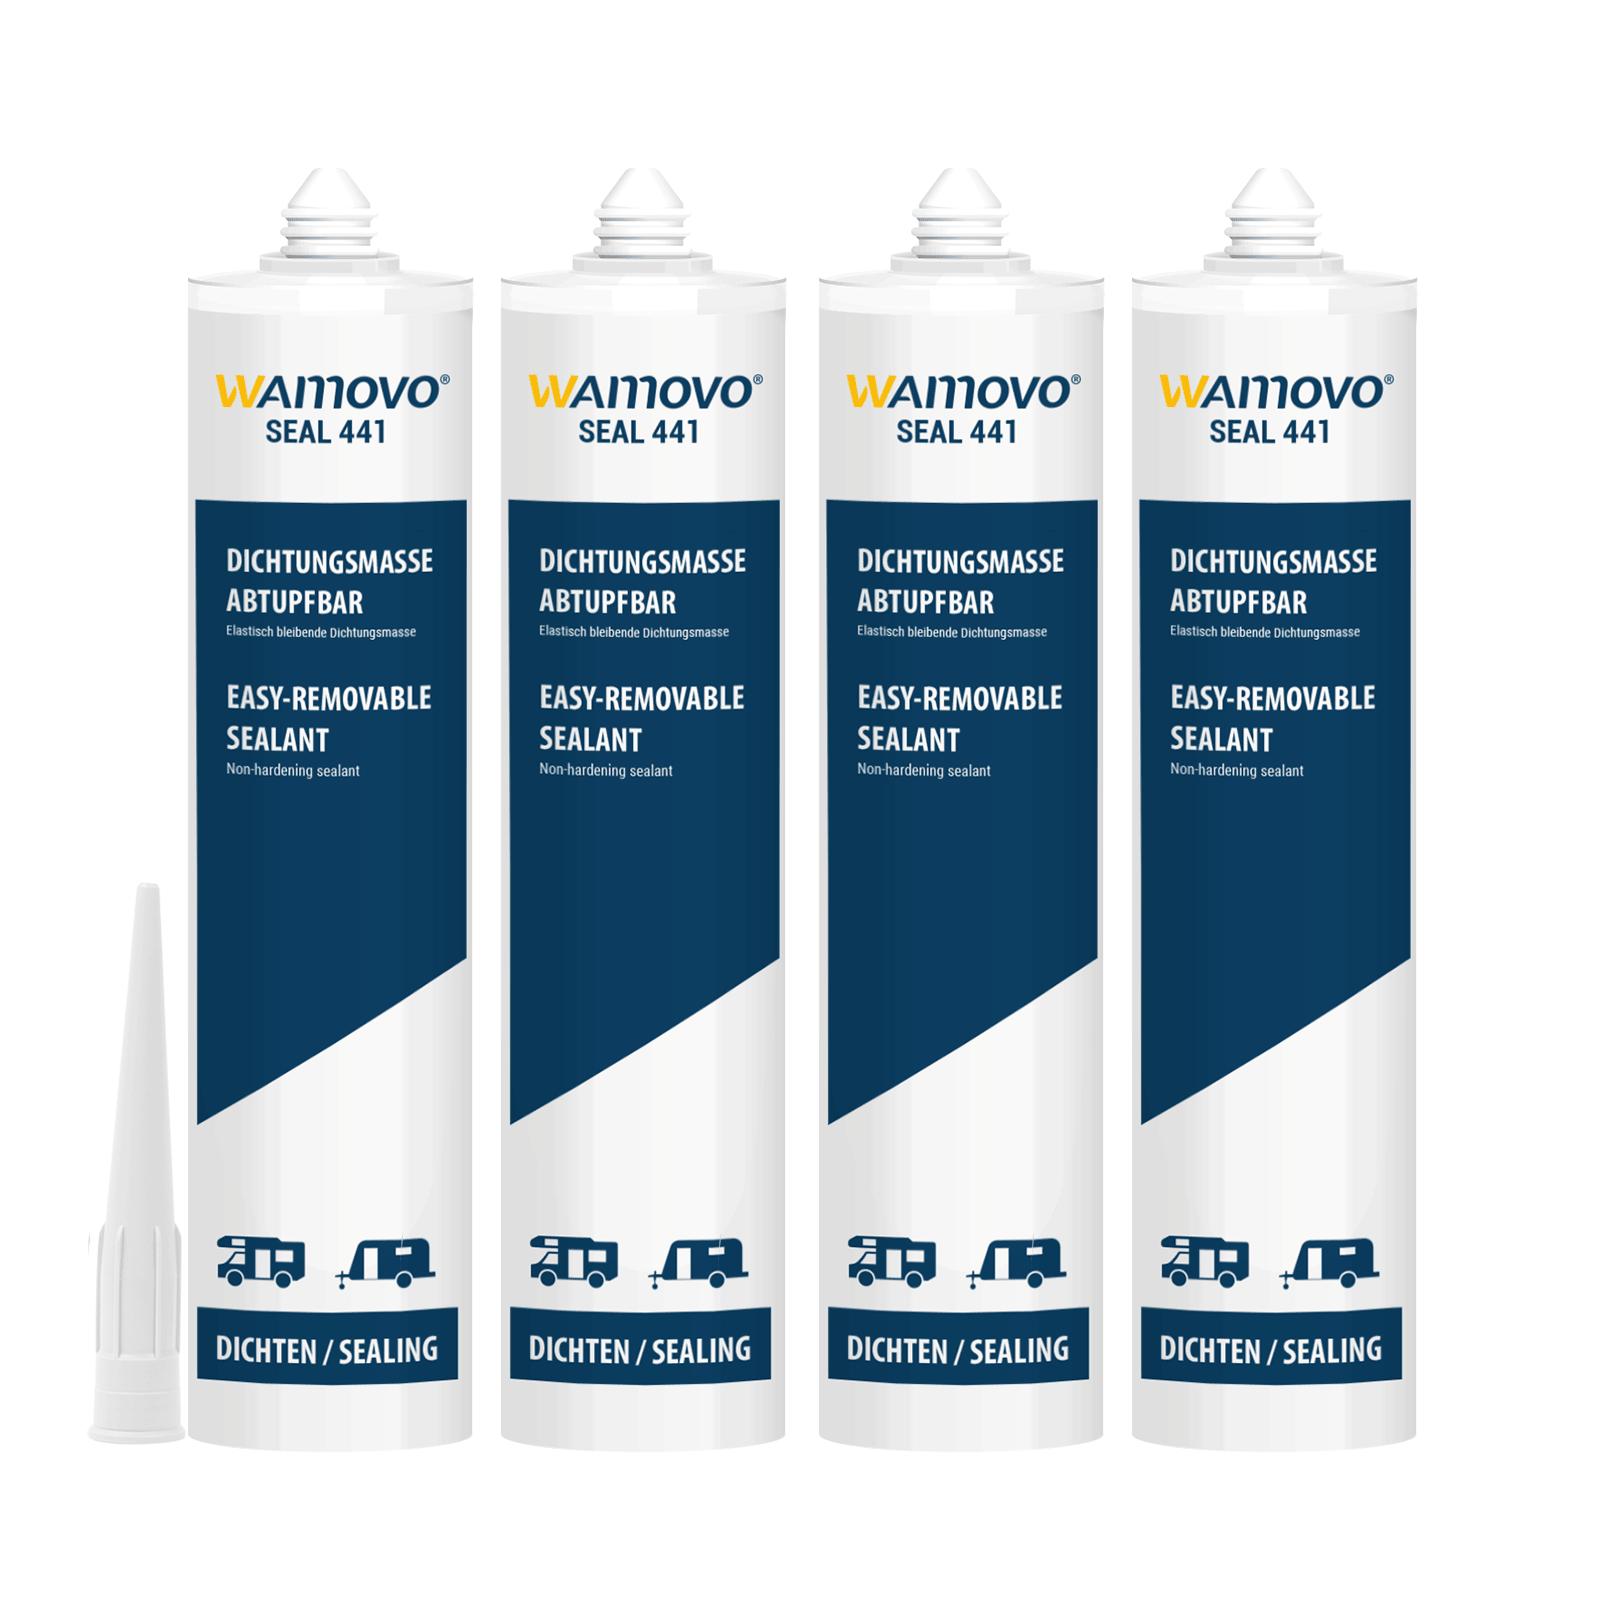 wamovo® Dichtstoff SEAL441 | 1240 ml | abtupfbar | Weiß | Dichtmasse